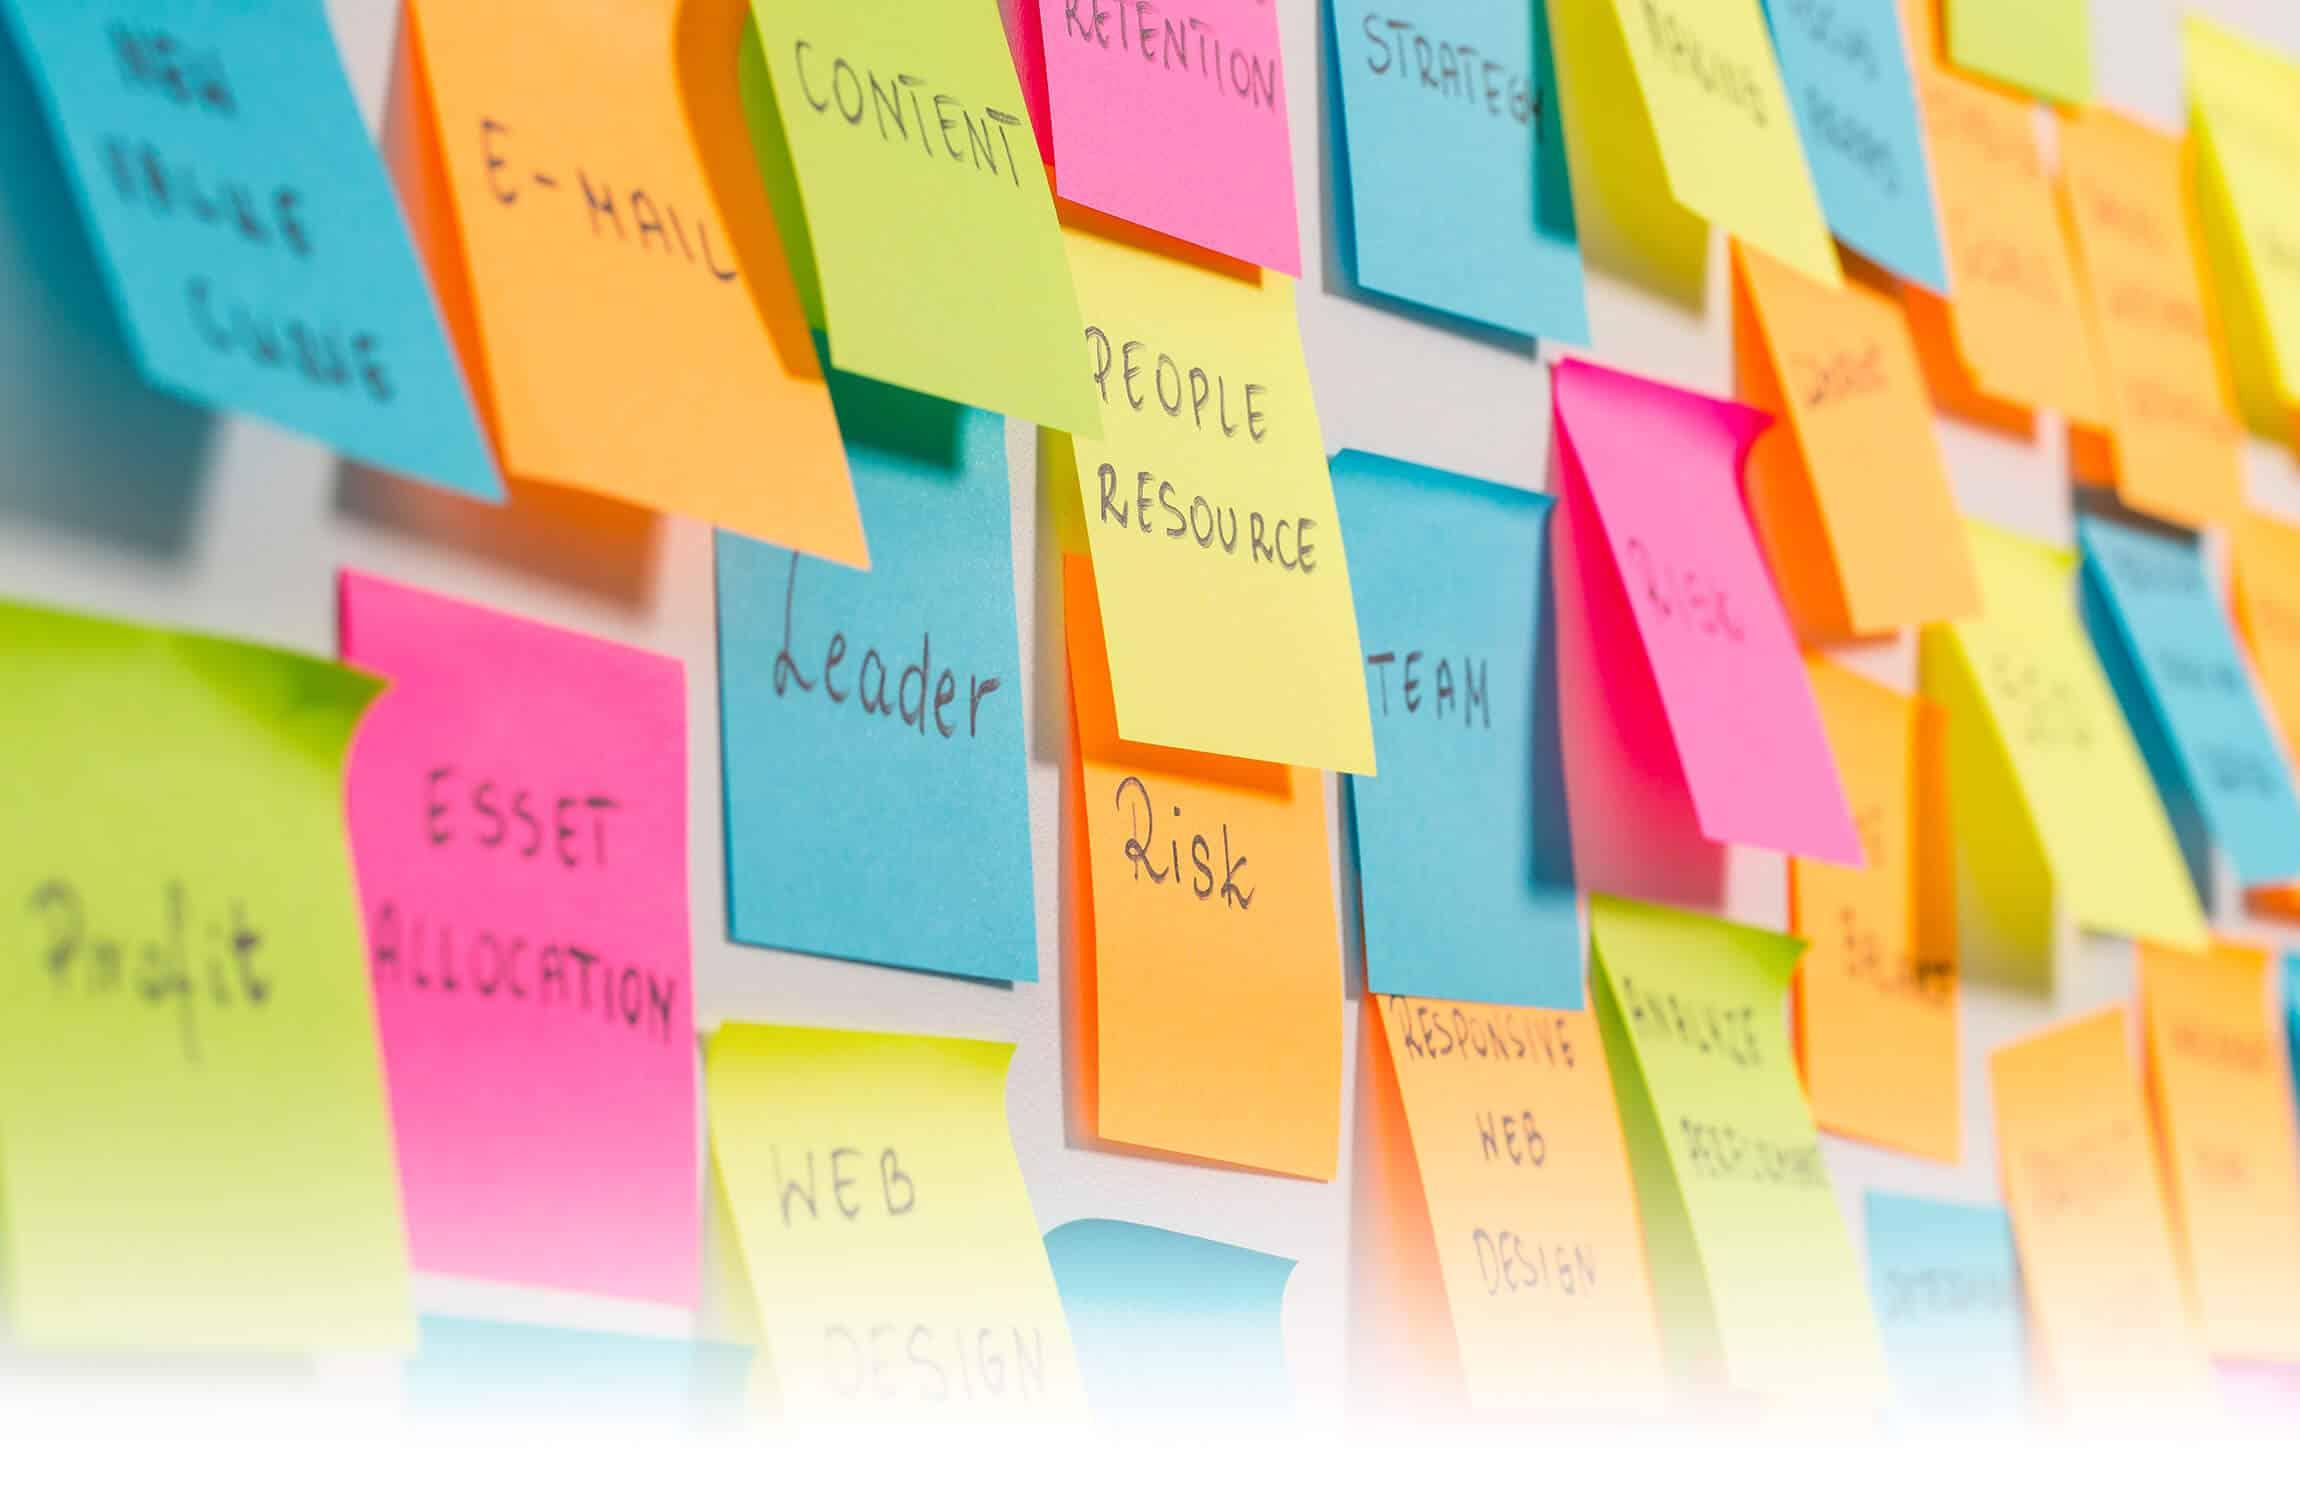 Marketing Management/Planning